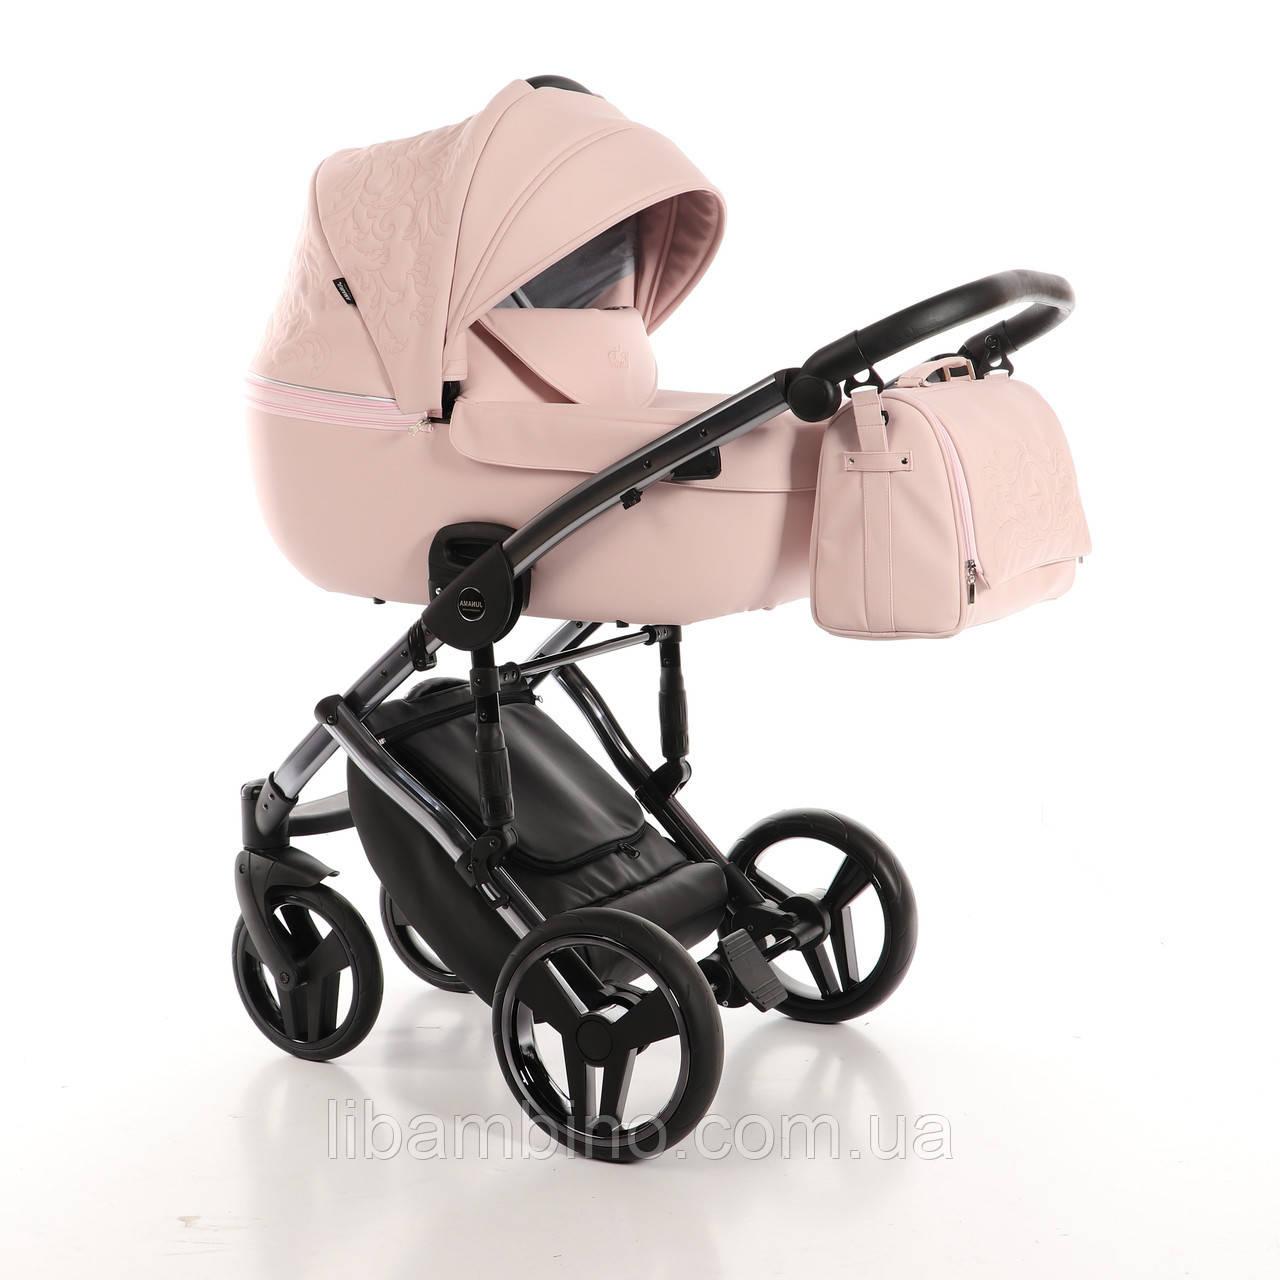 Дитяча універсальна коляска 2 в 1 Junama Enzo Go 02